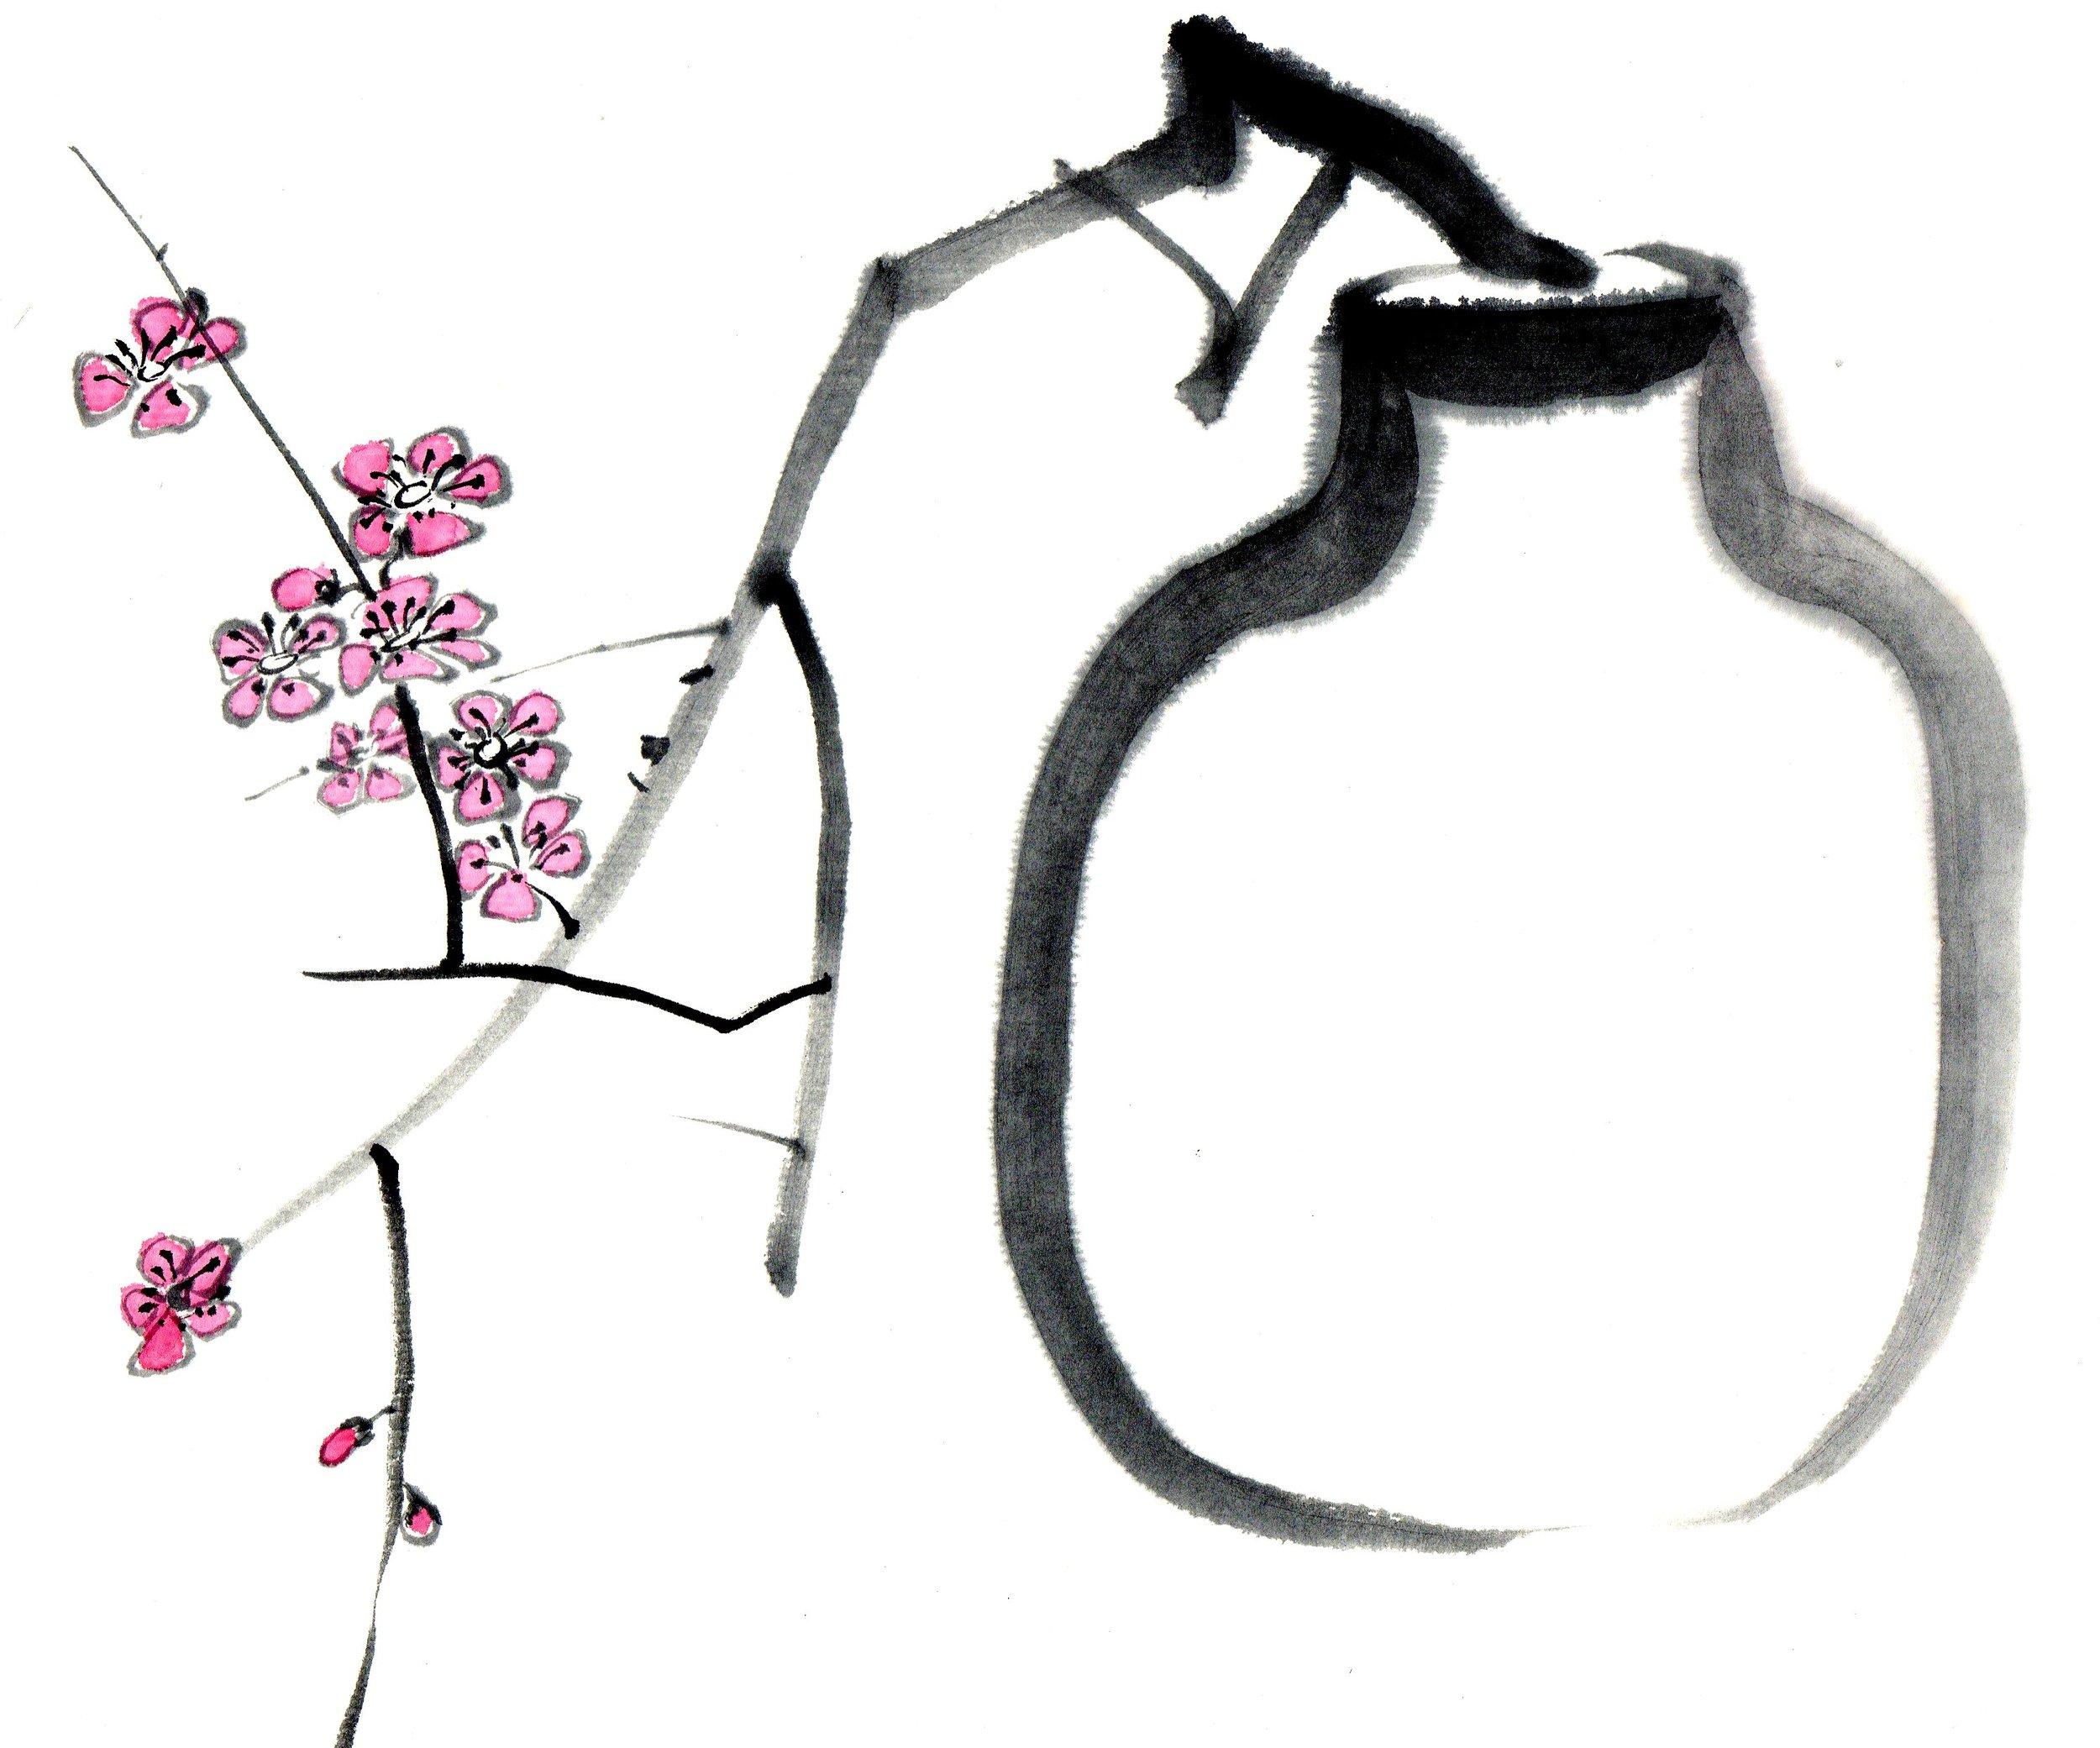 Vase & Blossom